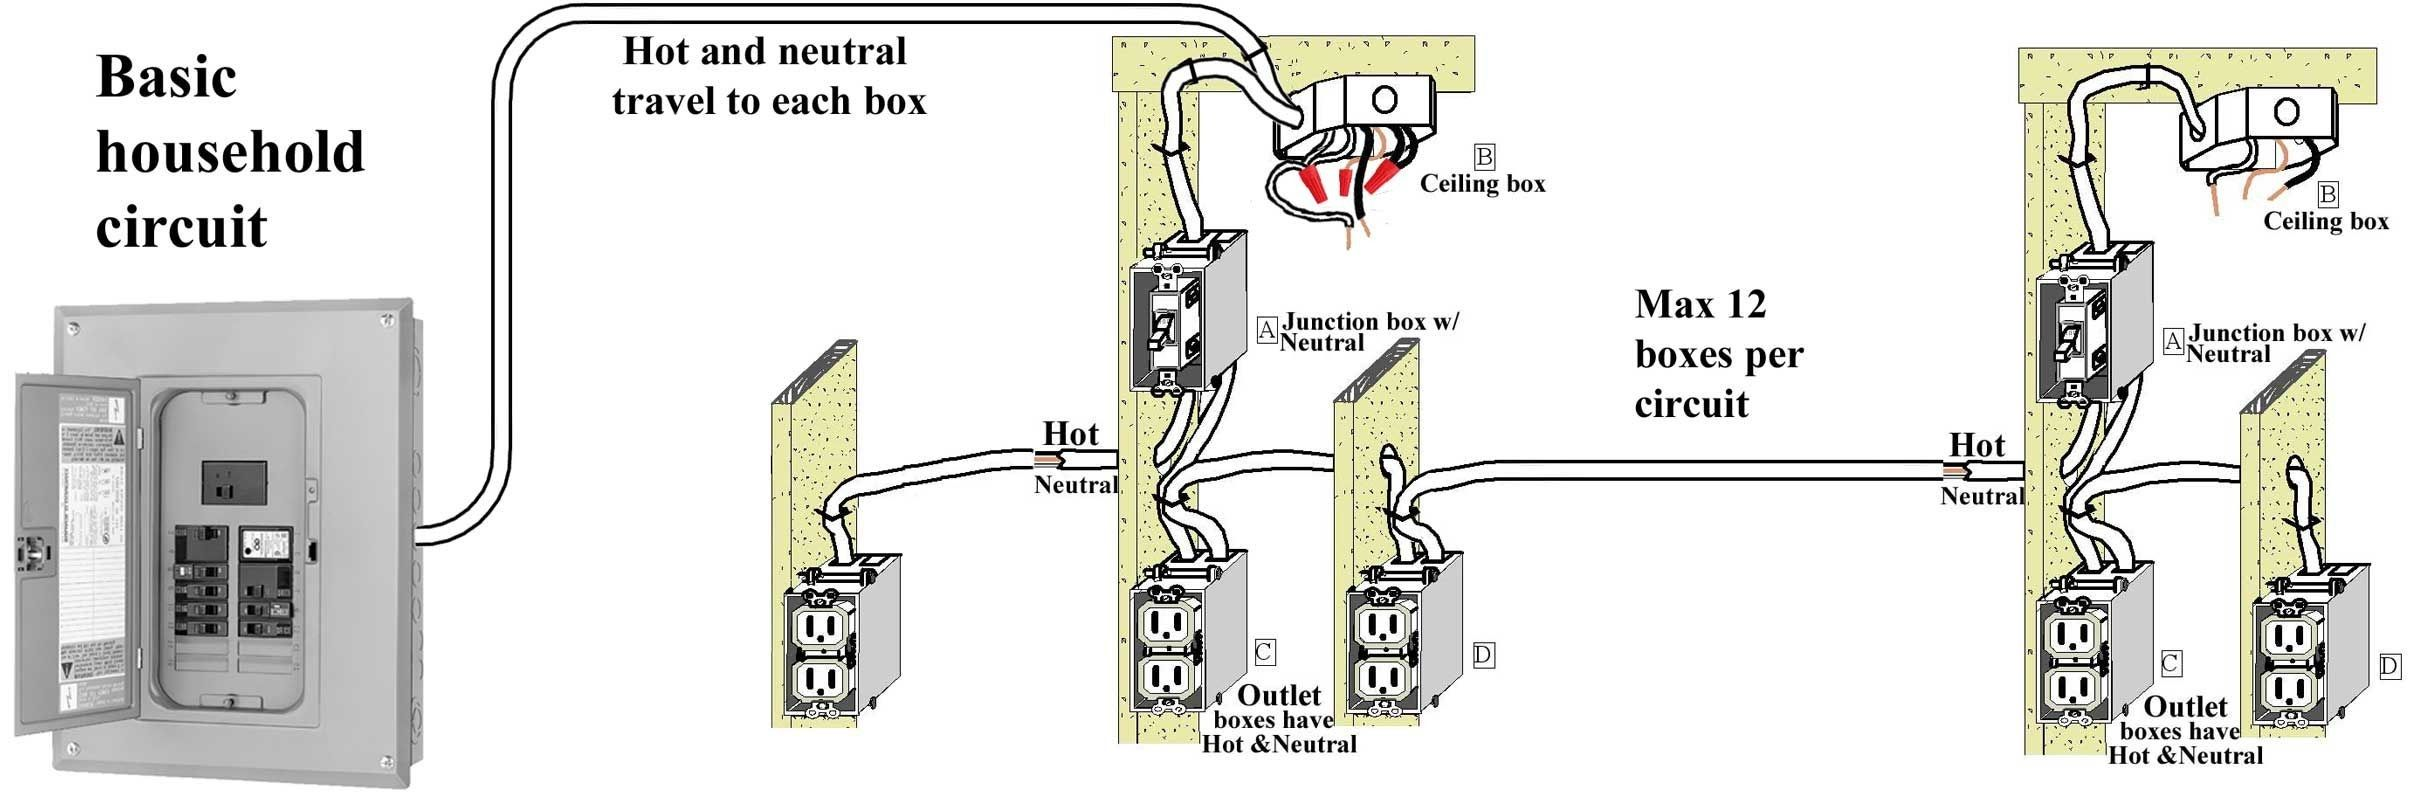 medium resolution of new basic electrical wiring diagram diagram wiringdiagram diagramming diagramm visuals